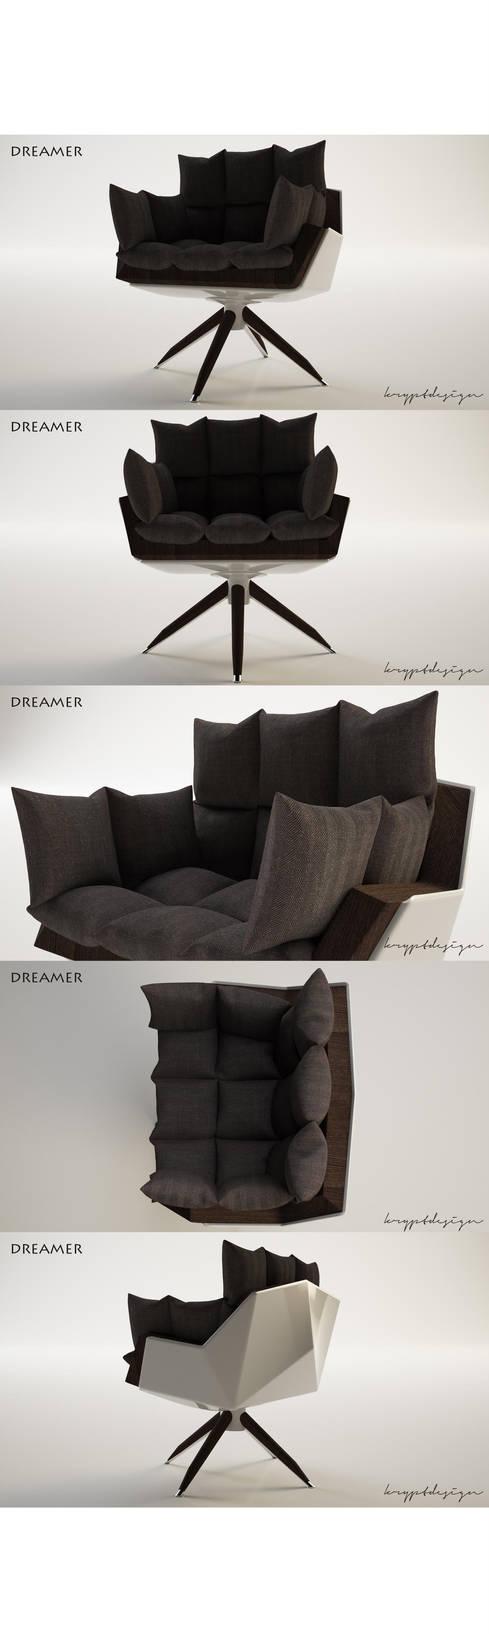 DREAMER presentation by KRYPT06